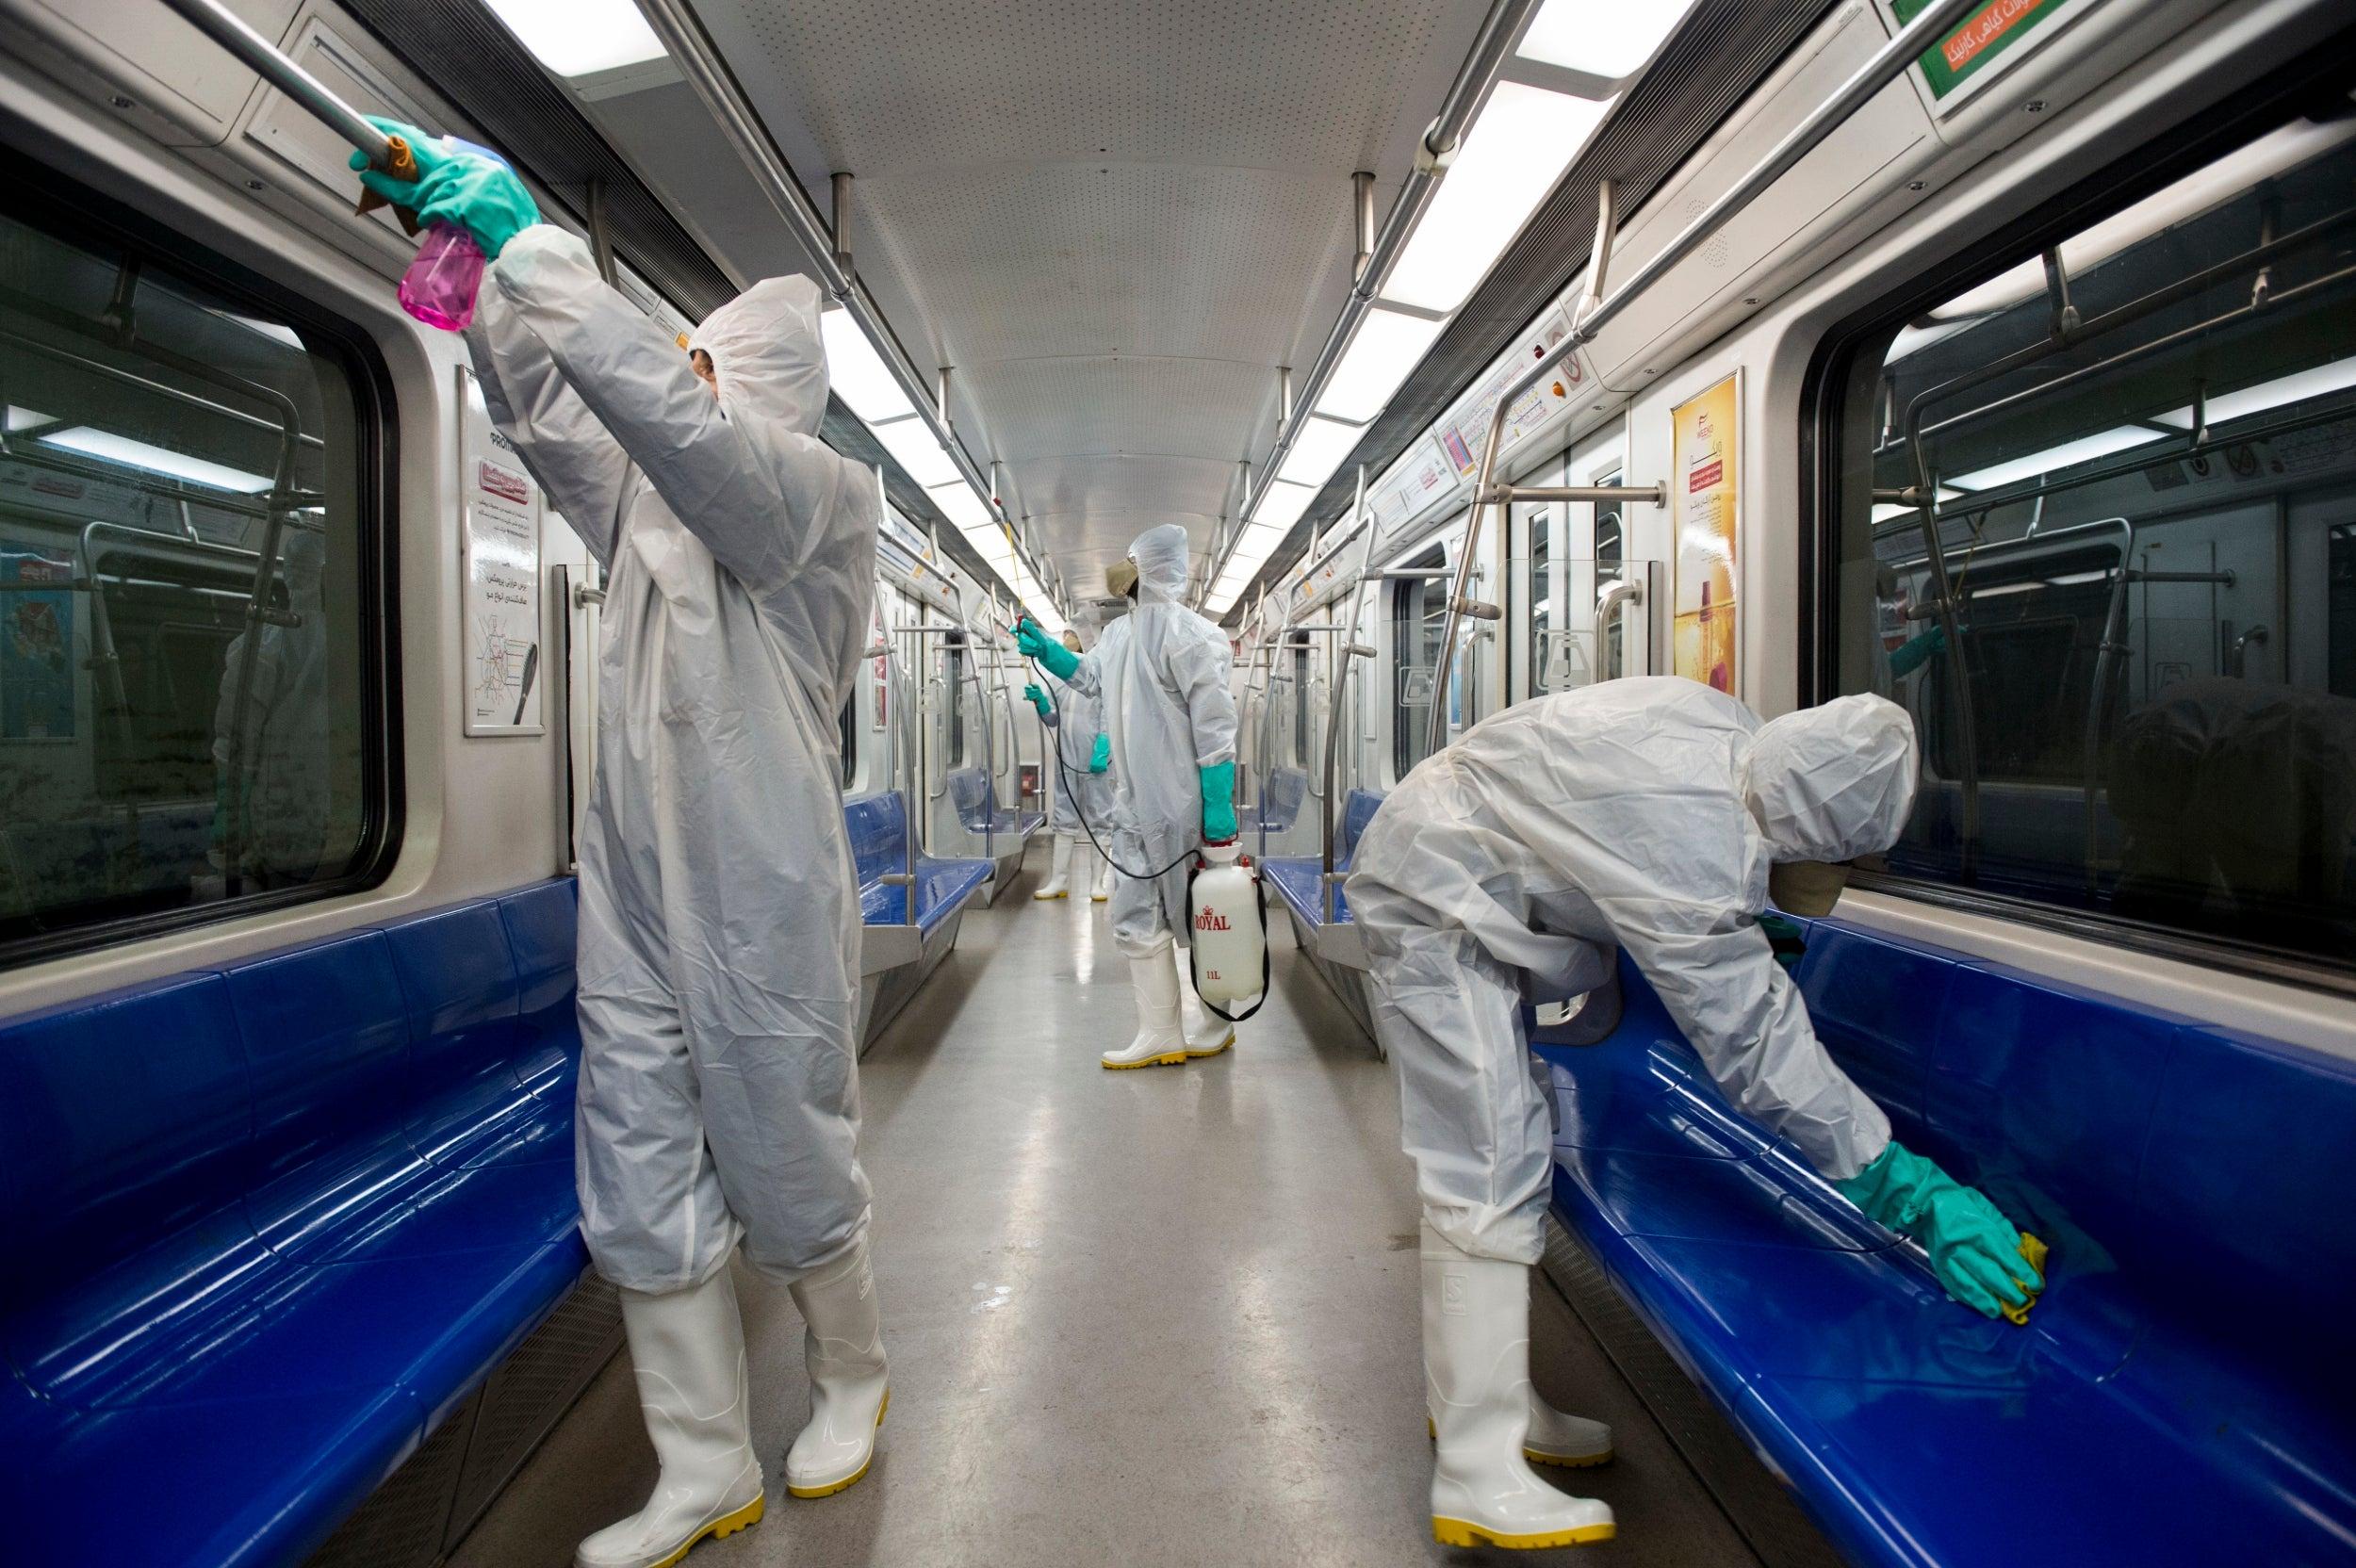 Robert Fisk: Iran's coronavirus outbreak is reminiscent of the Black Death